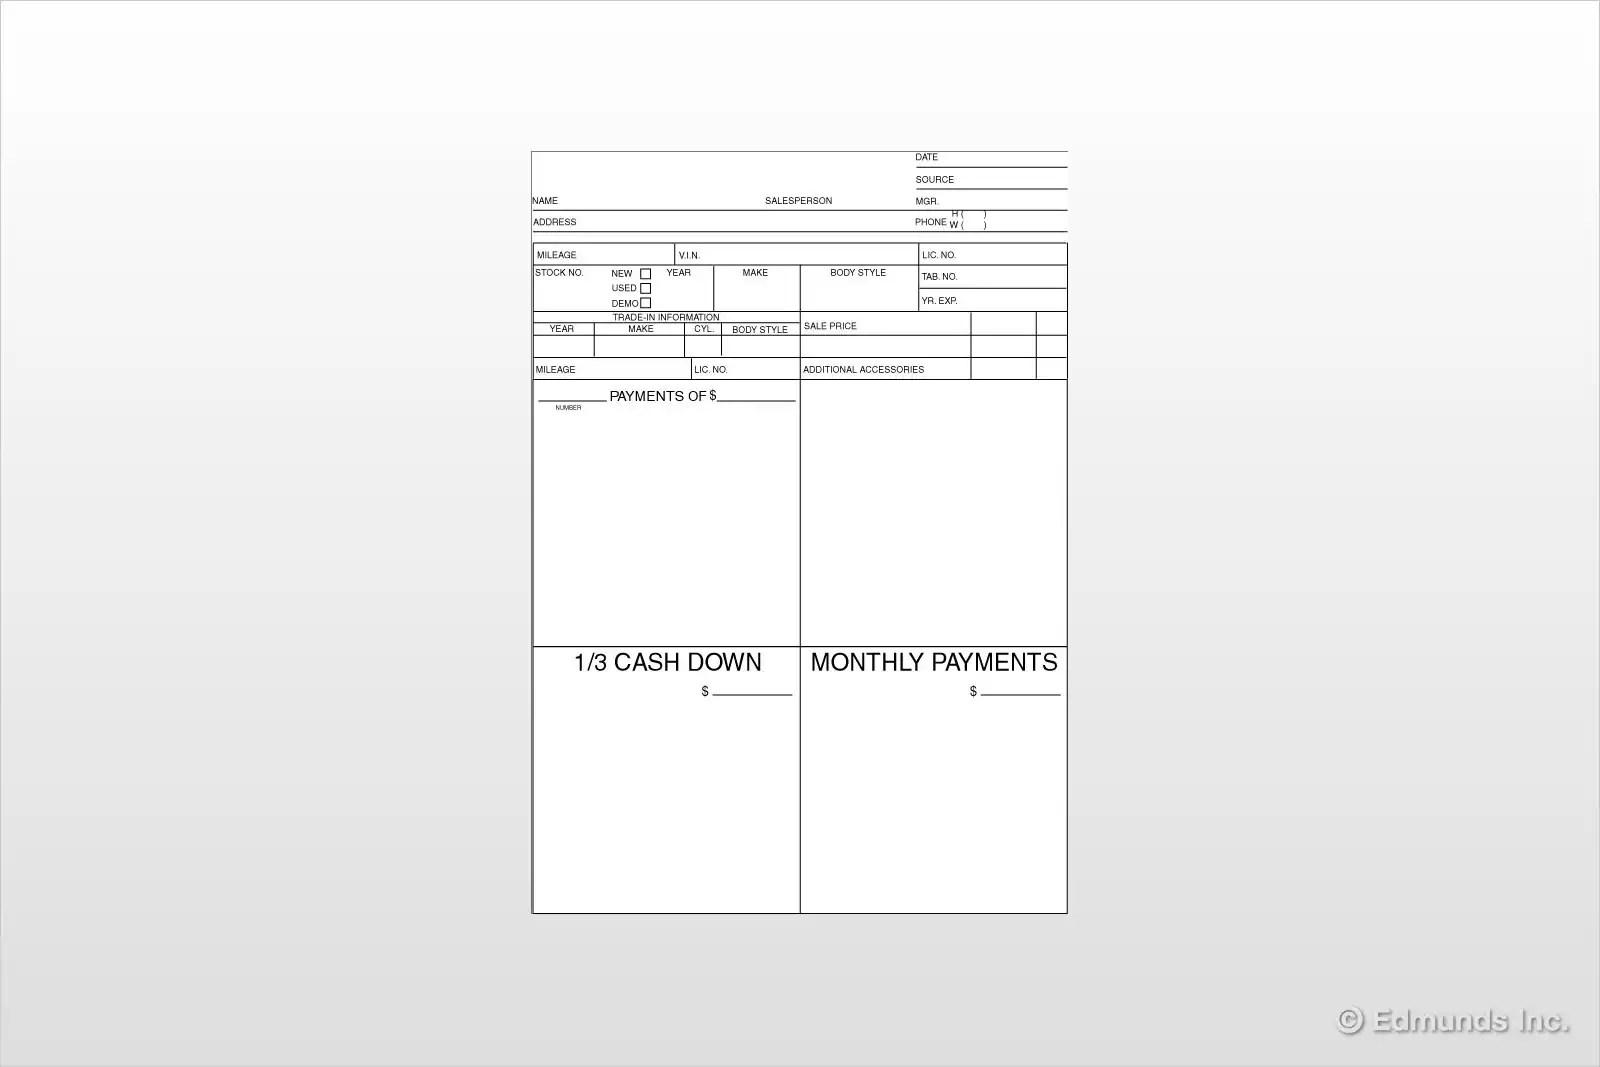 Eftps Tax Payment Report Worksheet